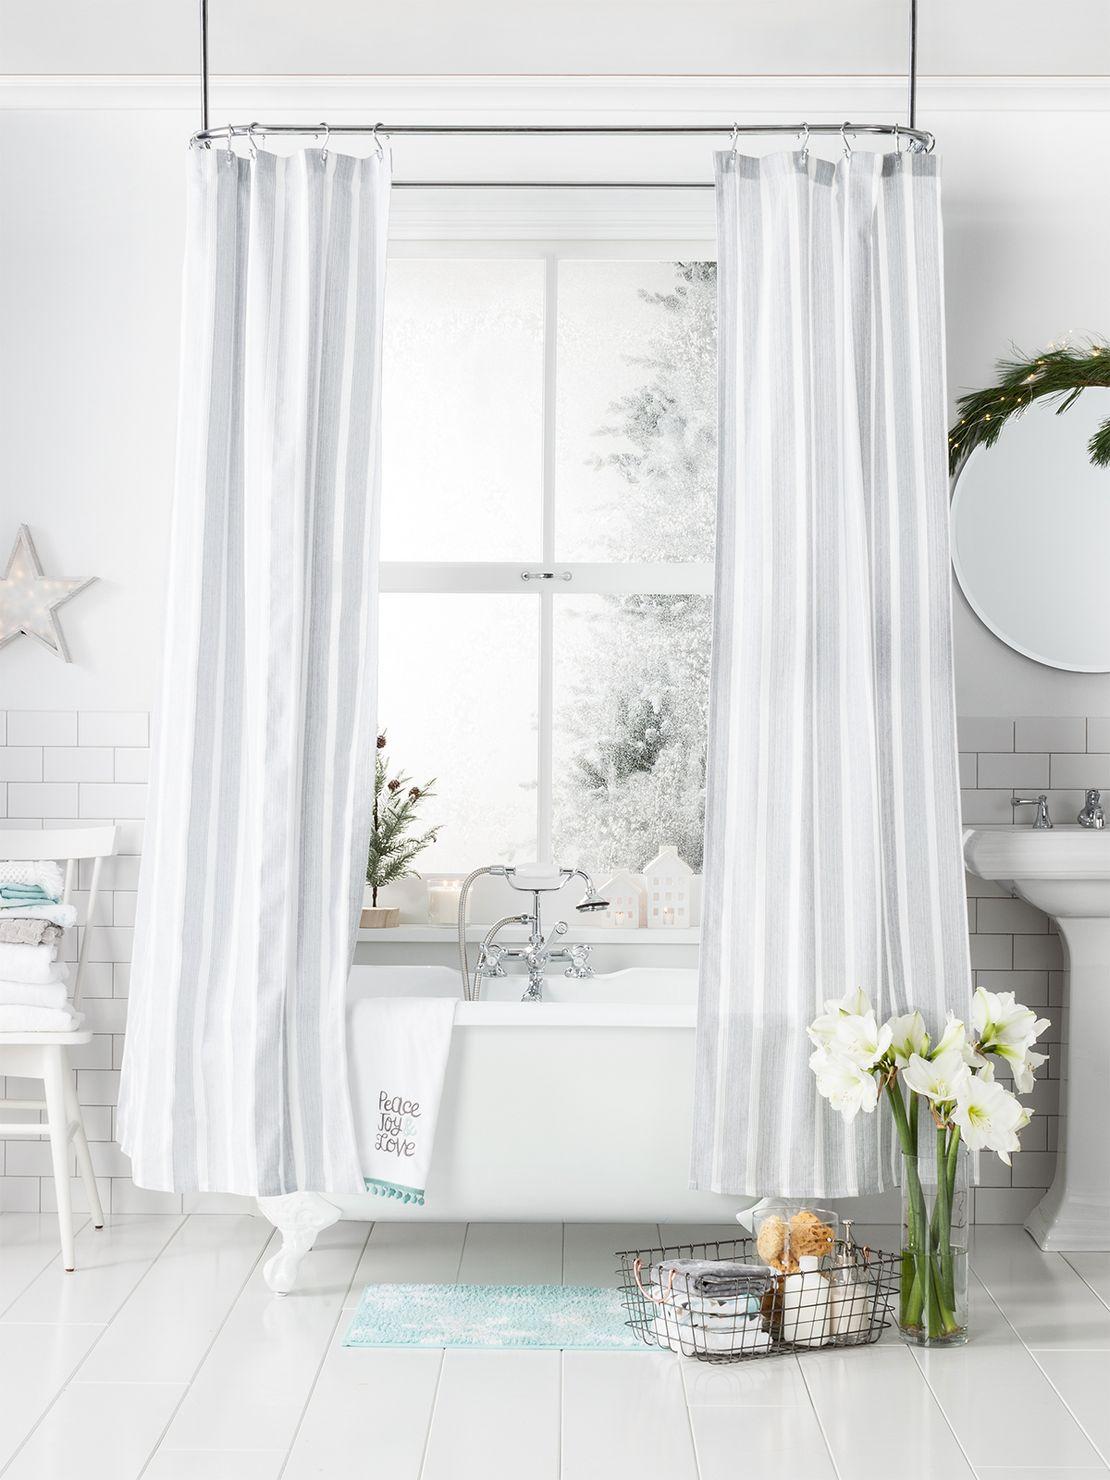 Bathroom Decor Target - Fieldcrest bath towels for small bathroom ideas